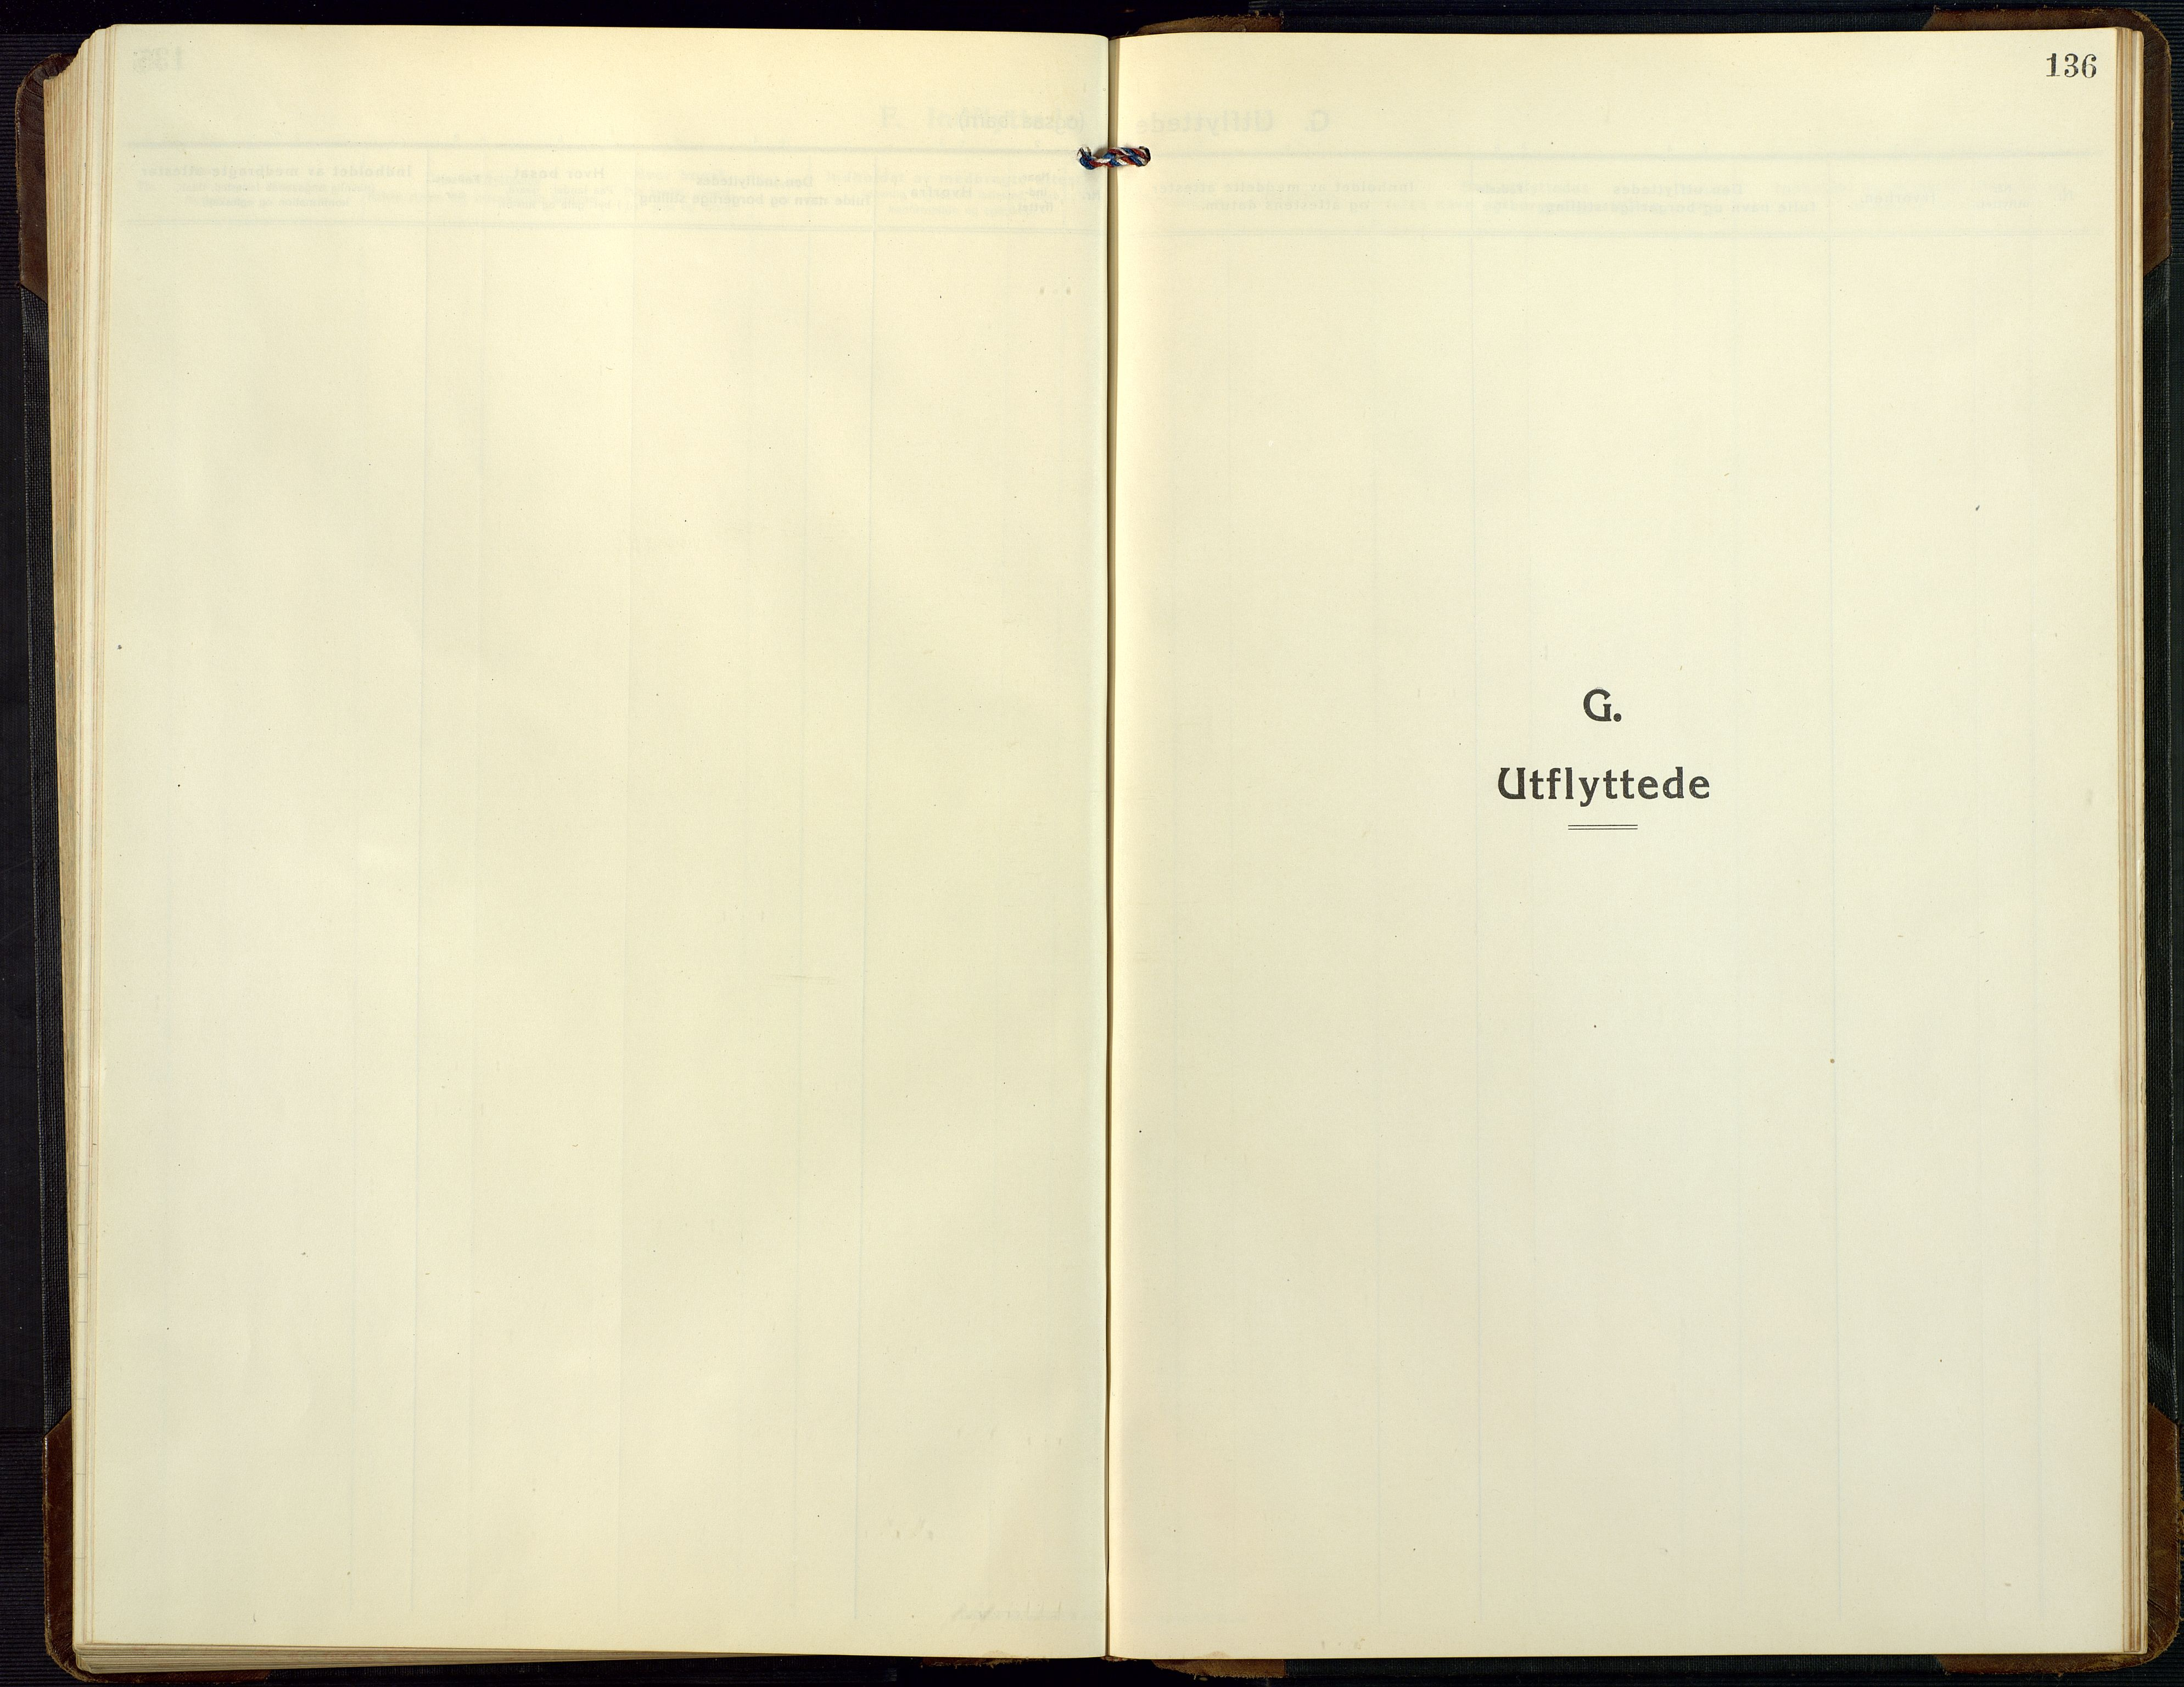 SAK, Dypvåg sokneprestkontor, F/Fb/Fbb/L0006: Klokkerbok nr. B 6, 1925-1954, s. 136